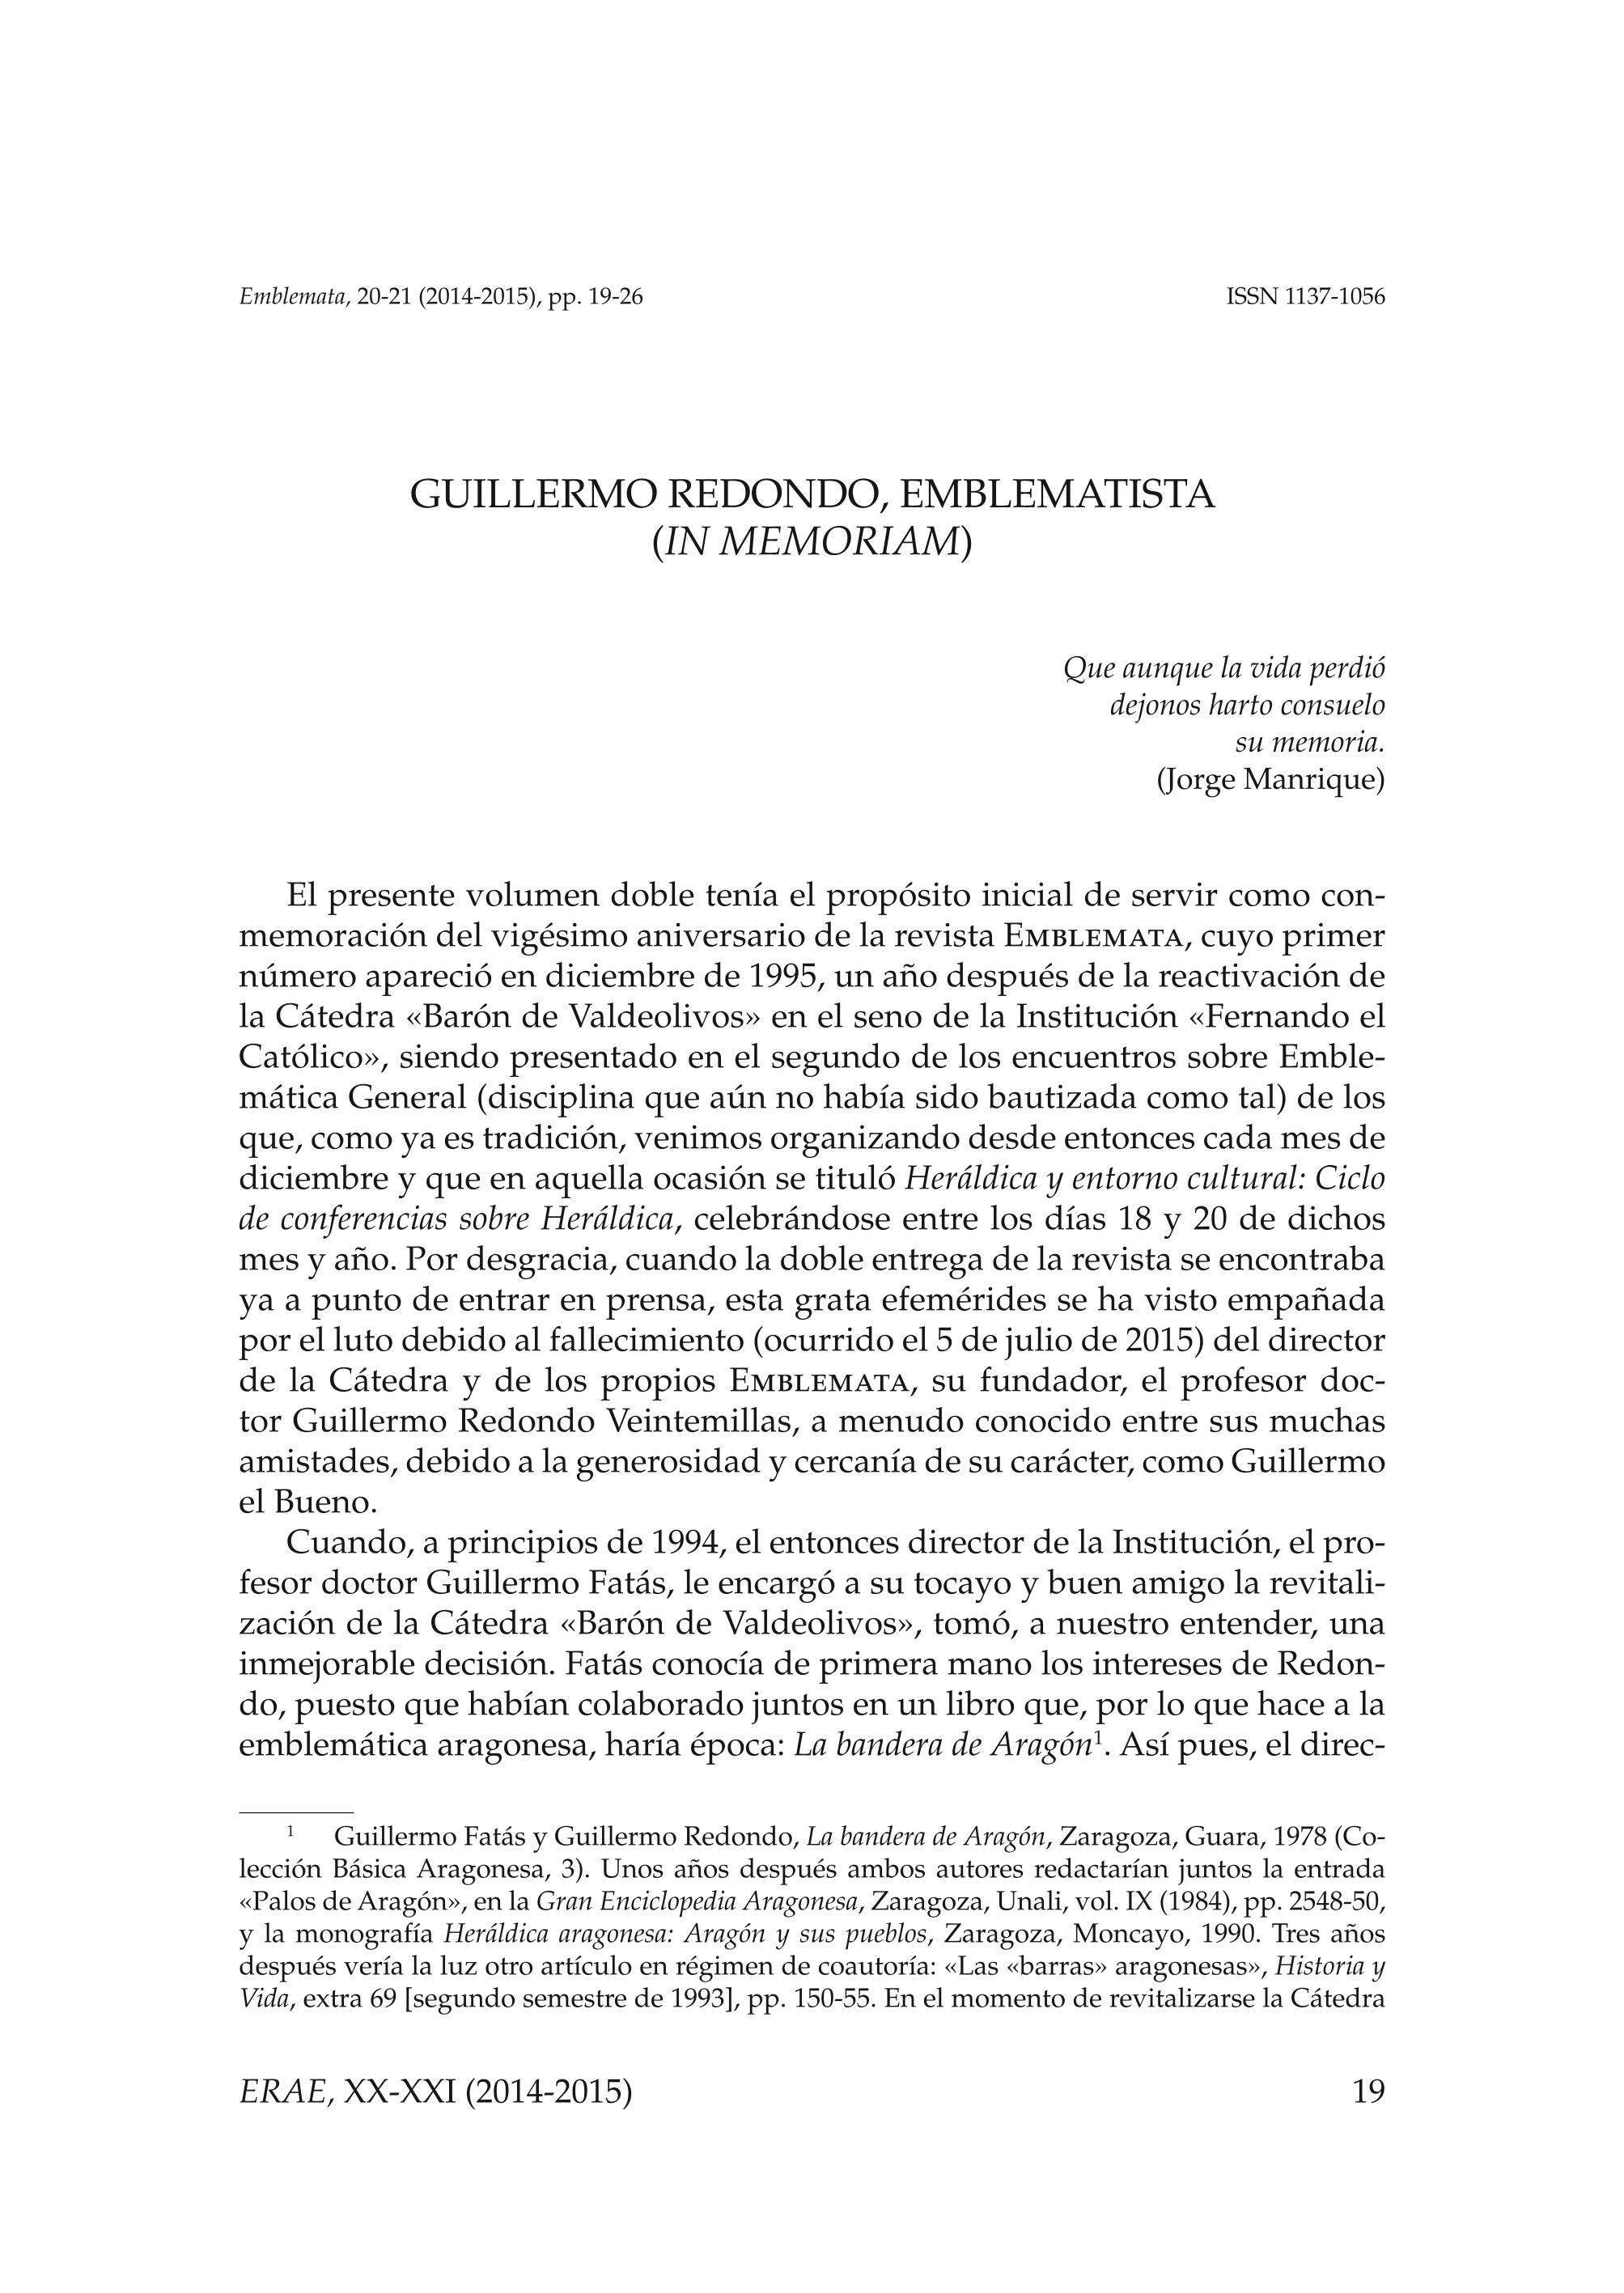 Guillermo Redondo, emblematista (in memoriam)